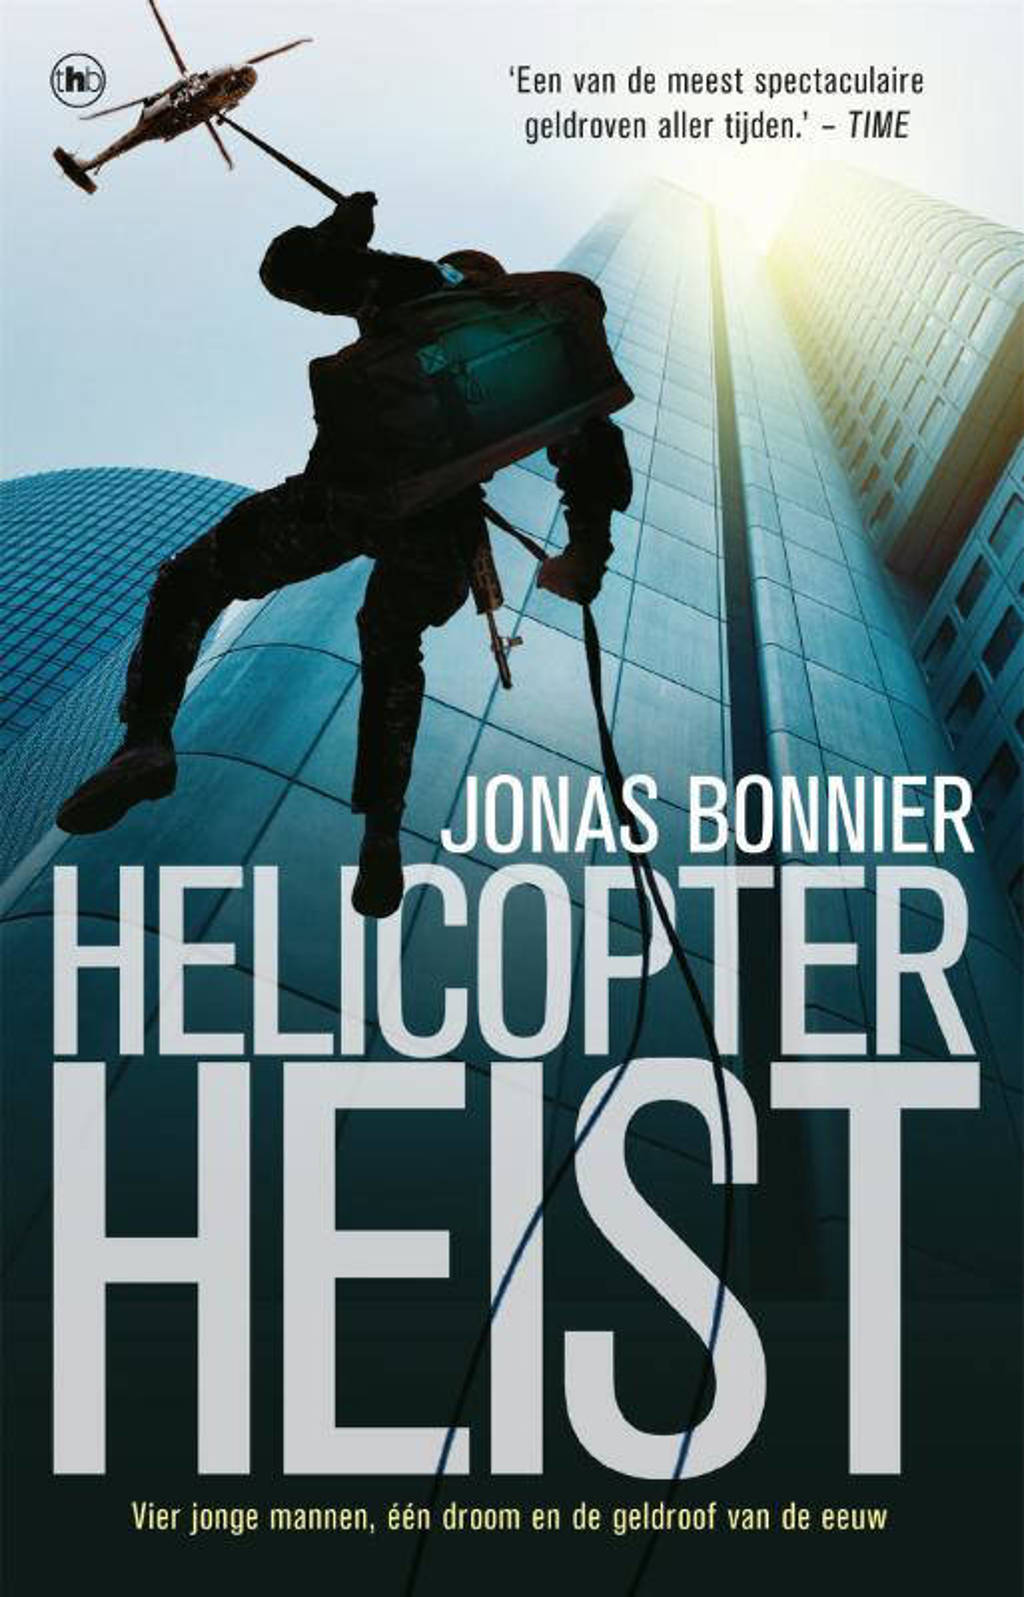 Helicopter Heist - Jonas Bonnier